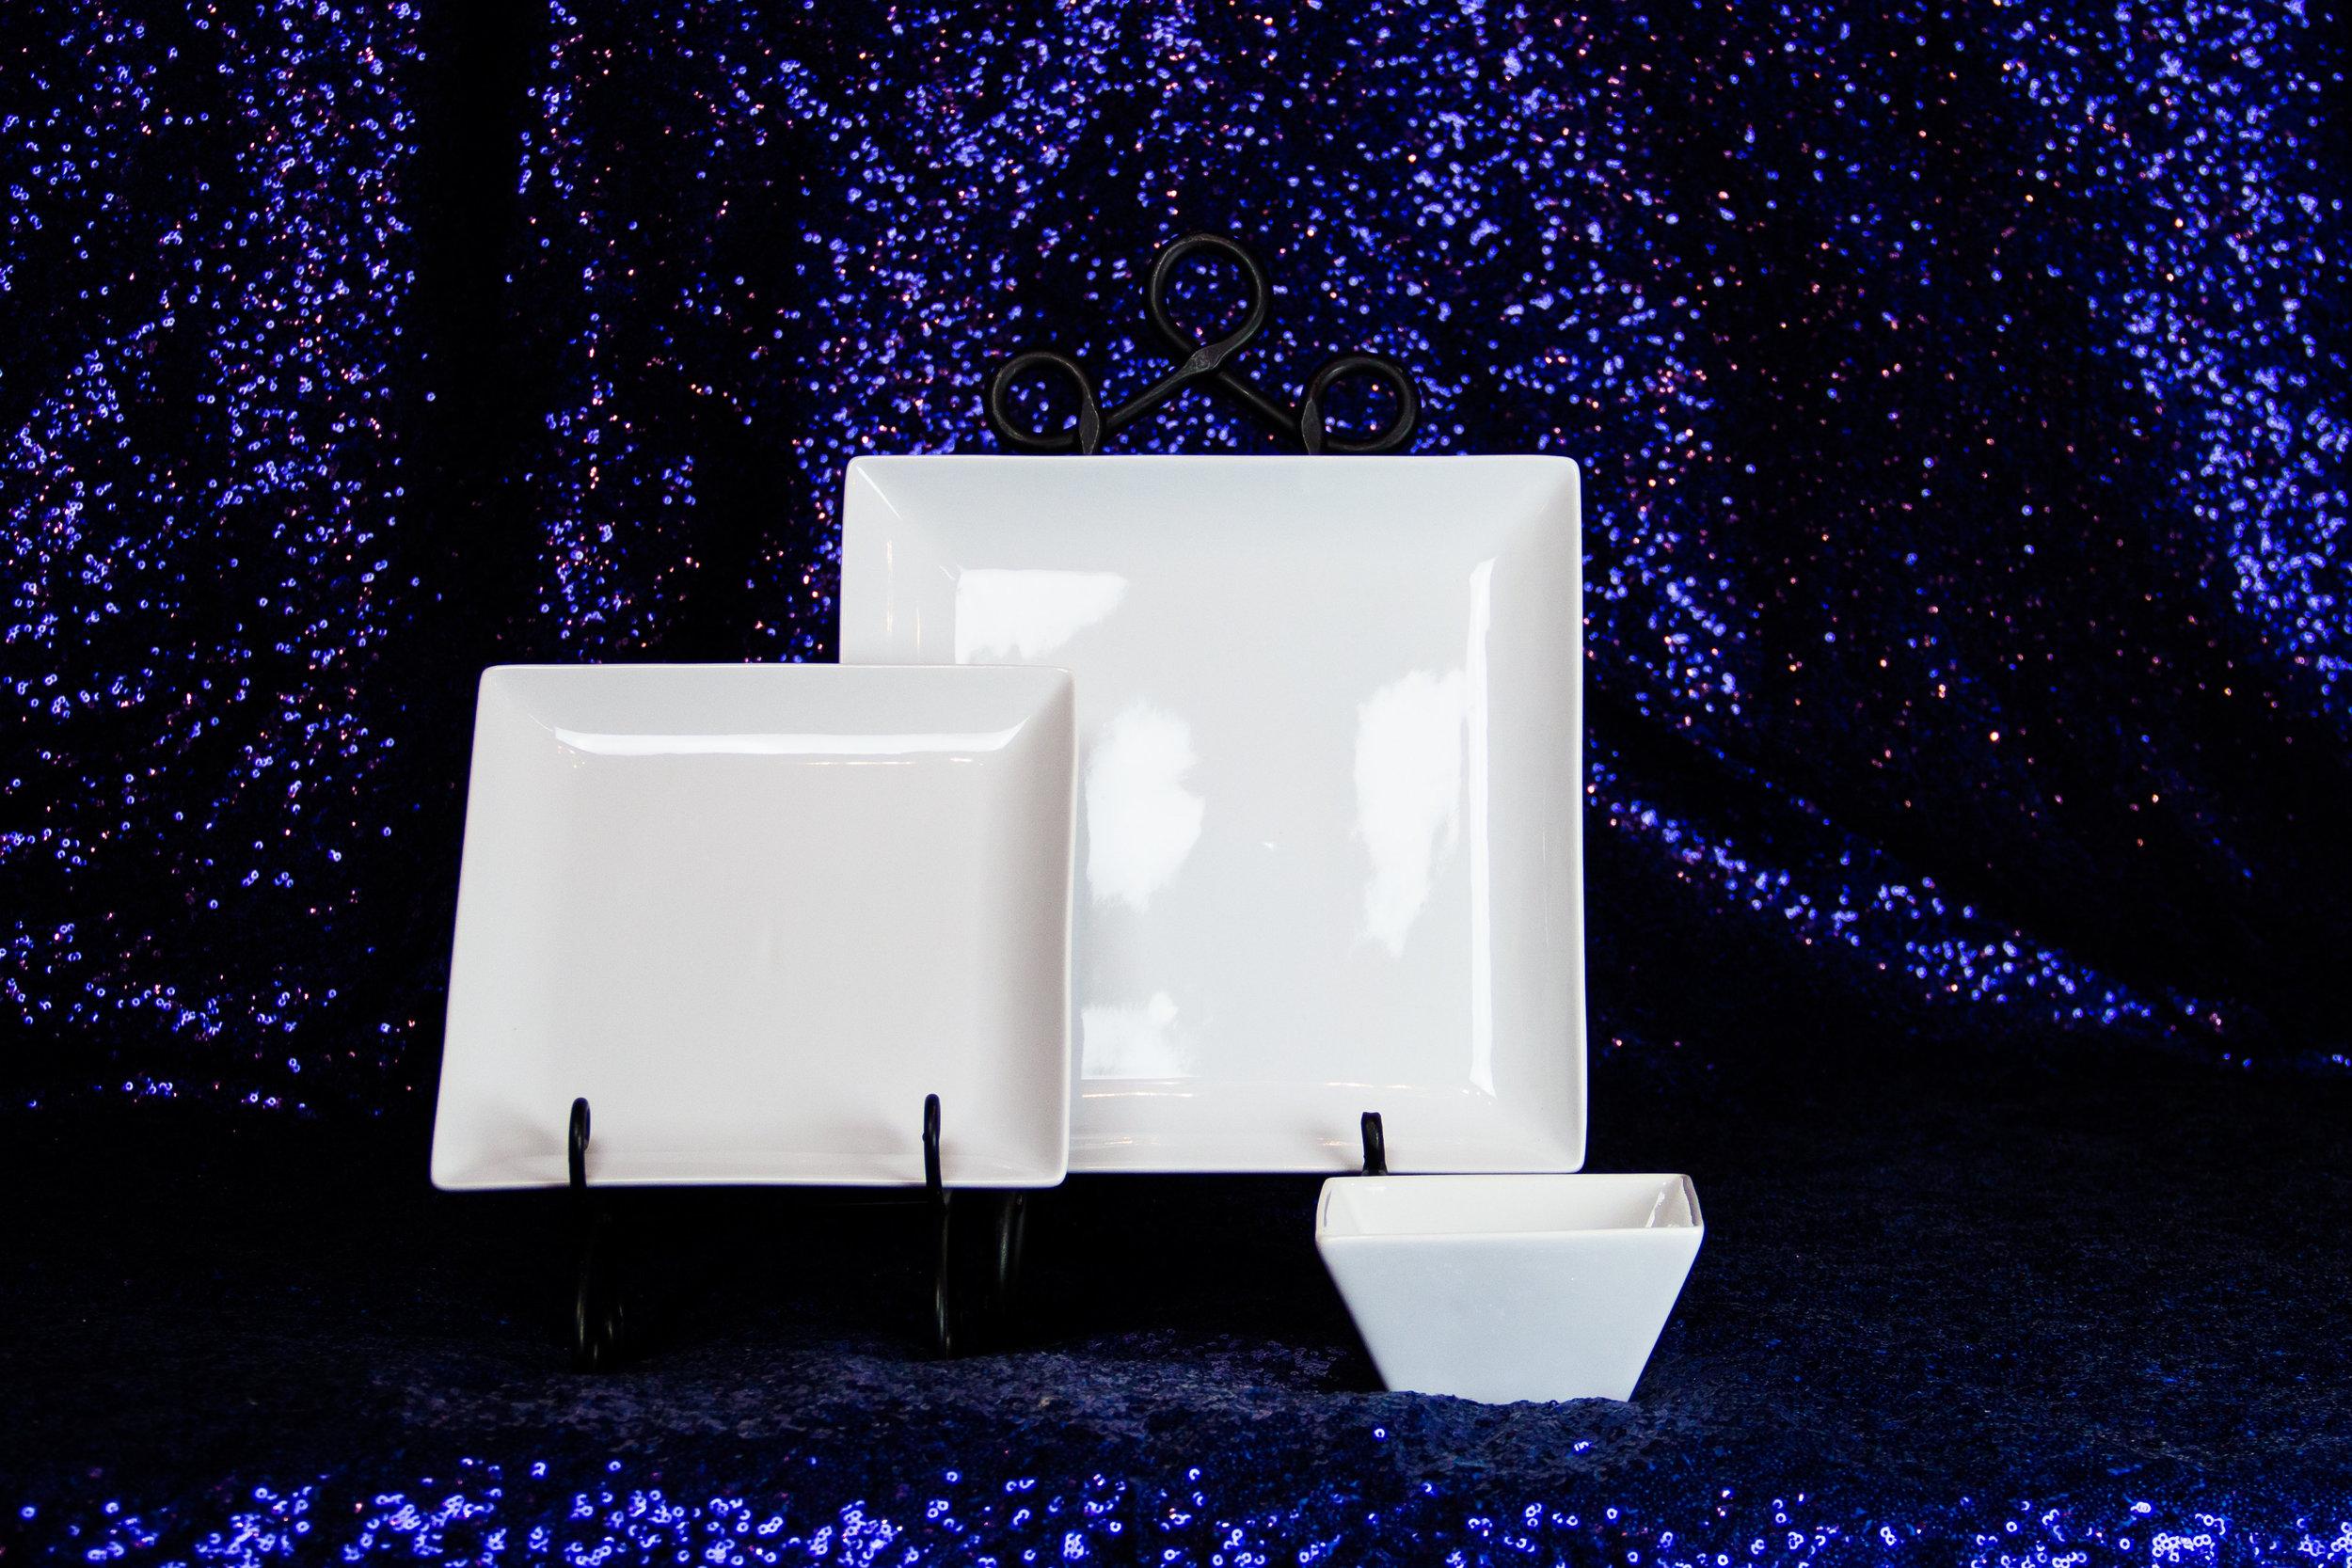 Square Plates & Bowls